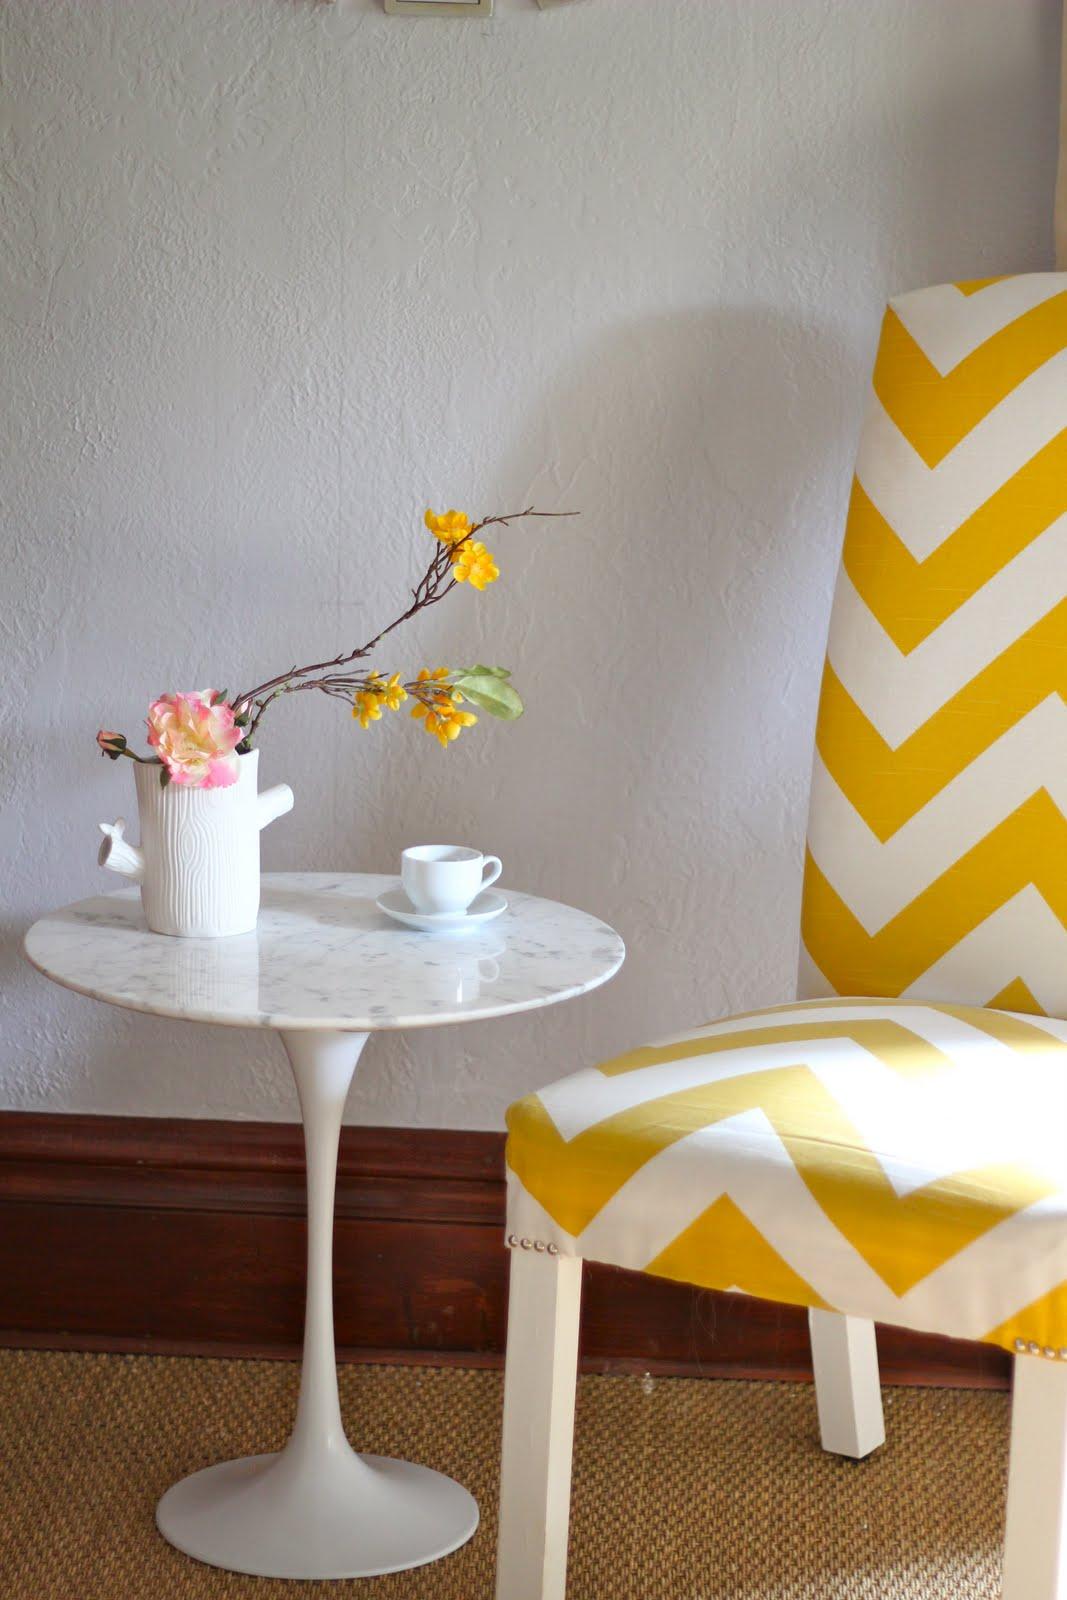 Back on festive road saarinen tulip table copy knock off - Saarinen chair knock off ...